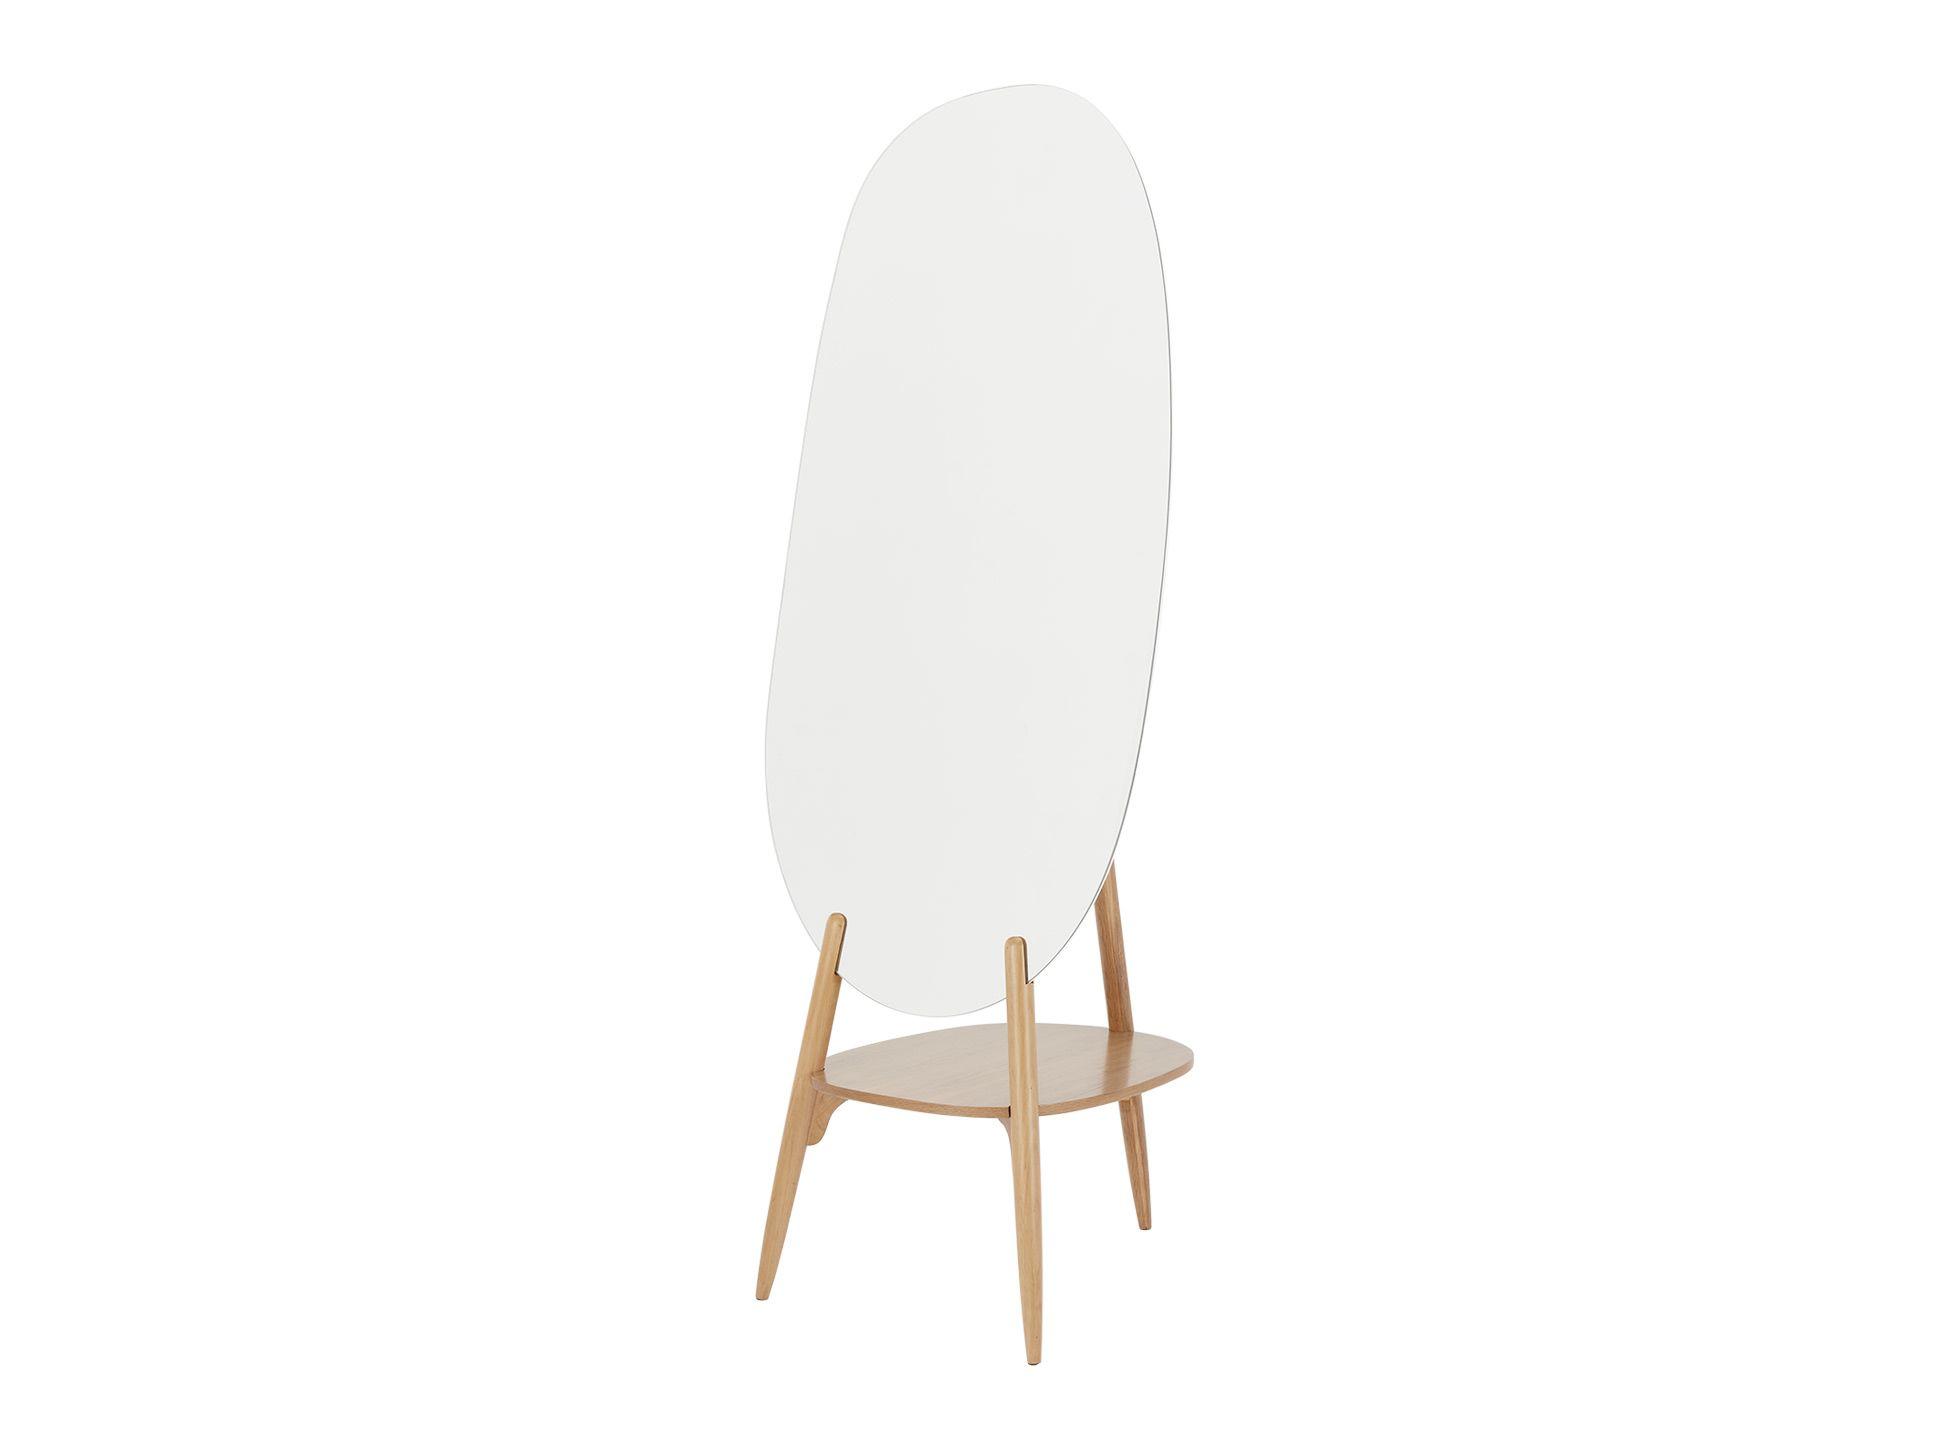 Staande Spiegel Ikea : Coco staande spiegel met rek eiken fresh house spiegel staande